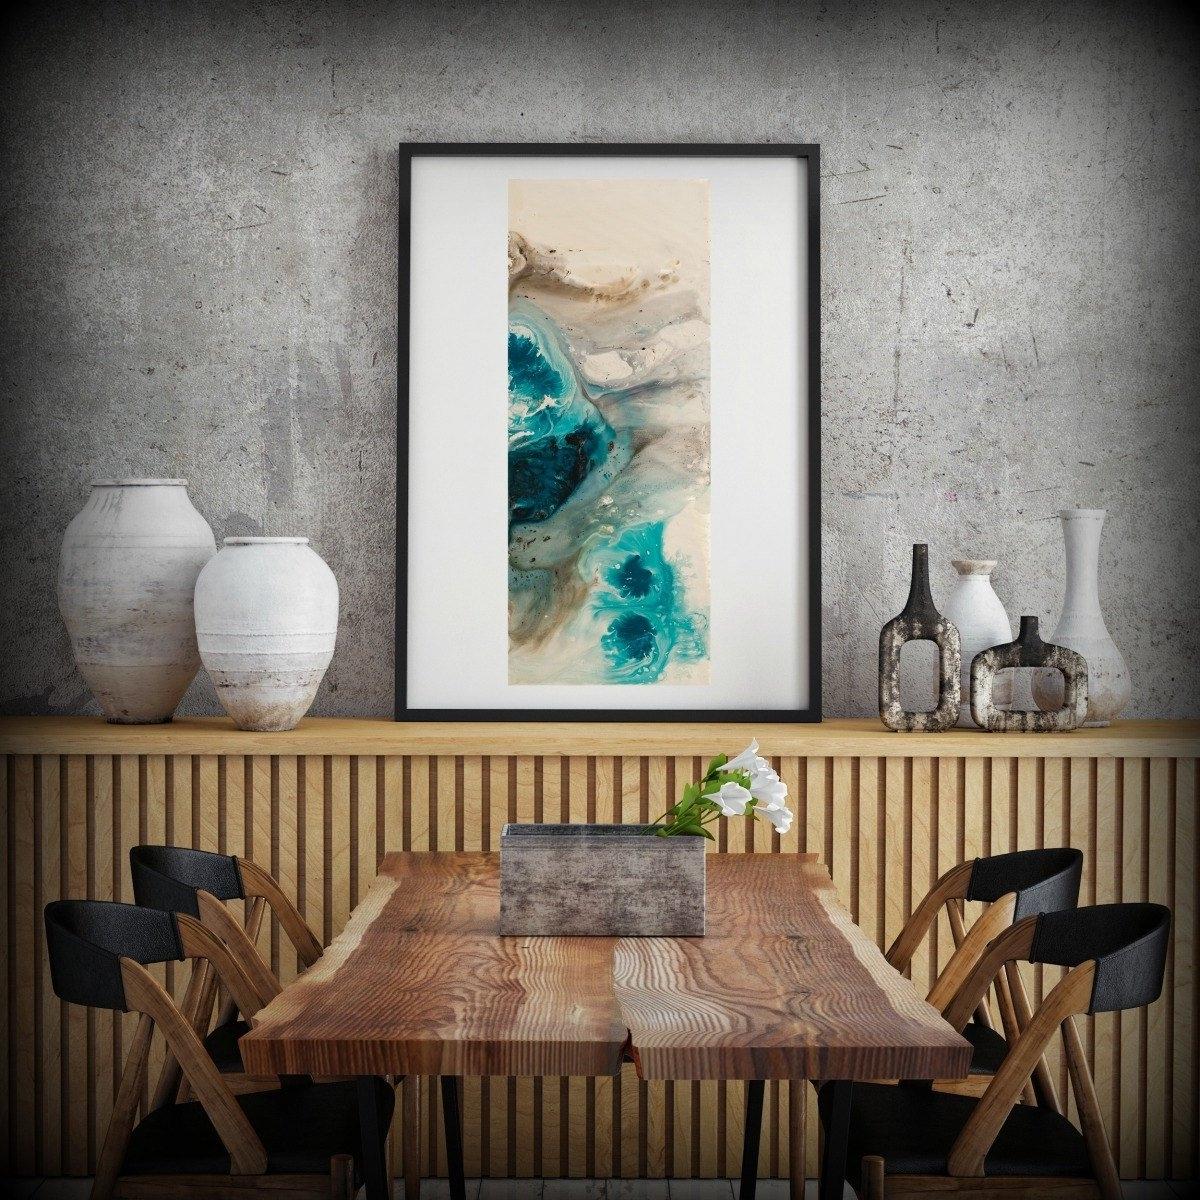 Minimalist Art, Boho Decor, Bohemian Wall Decor, Bedroom Decor Within Recent Affordable Wall Art (Gallery 13 of 20)